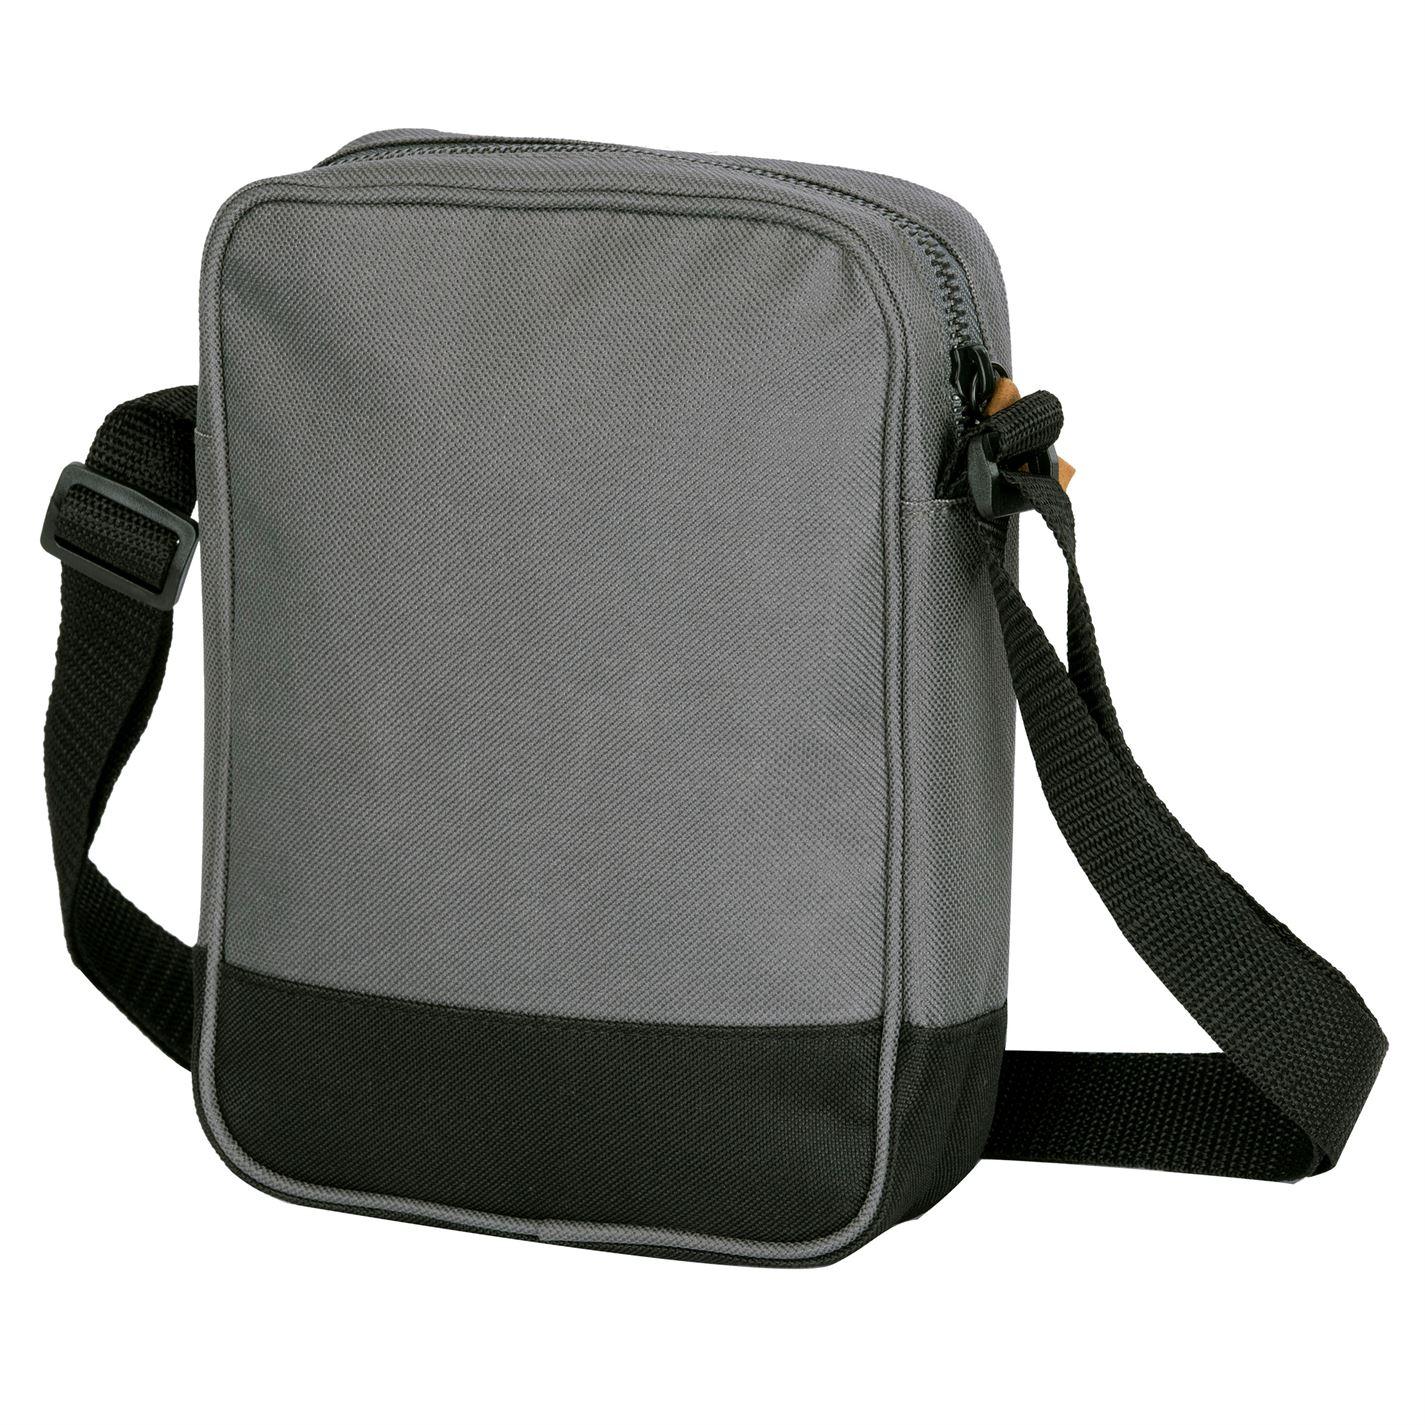 Unisex-SoulCal-Mini-Gadget-Bag-Zip-New thumbnail 5